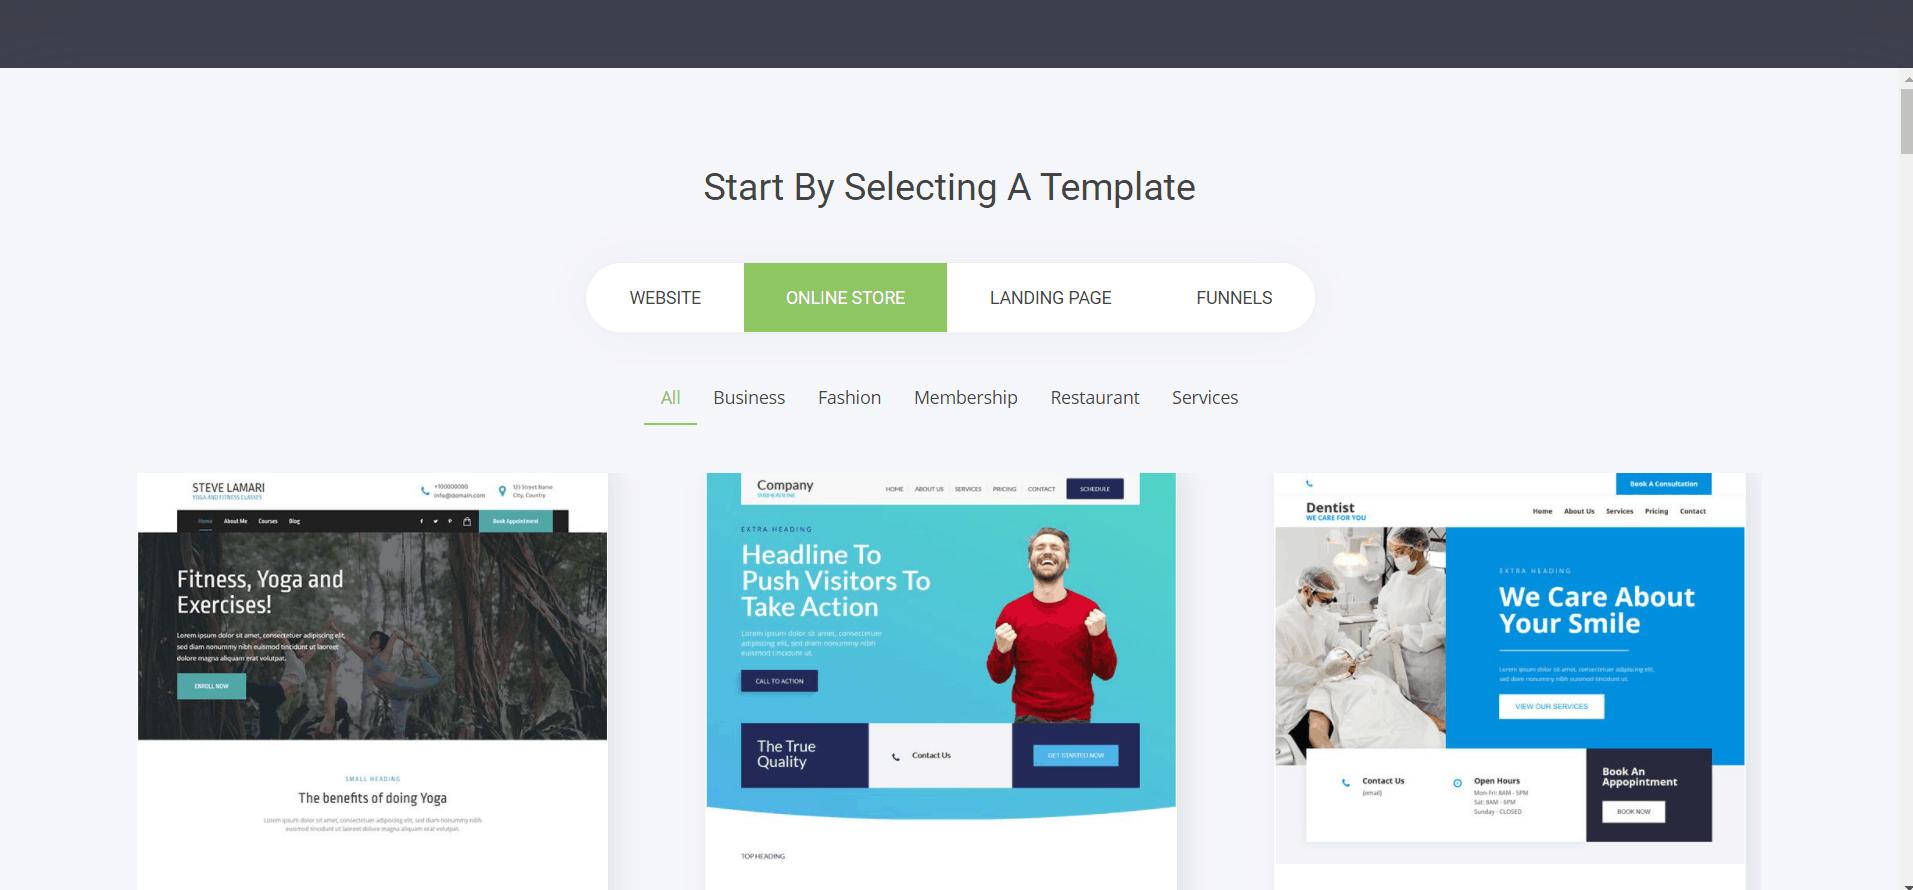 Webssly: Online Store design topics